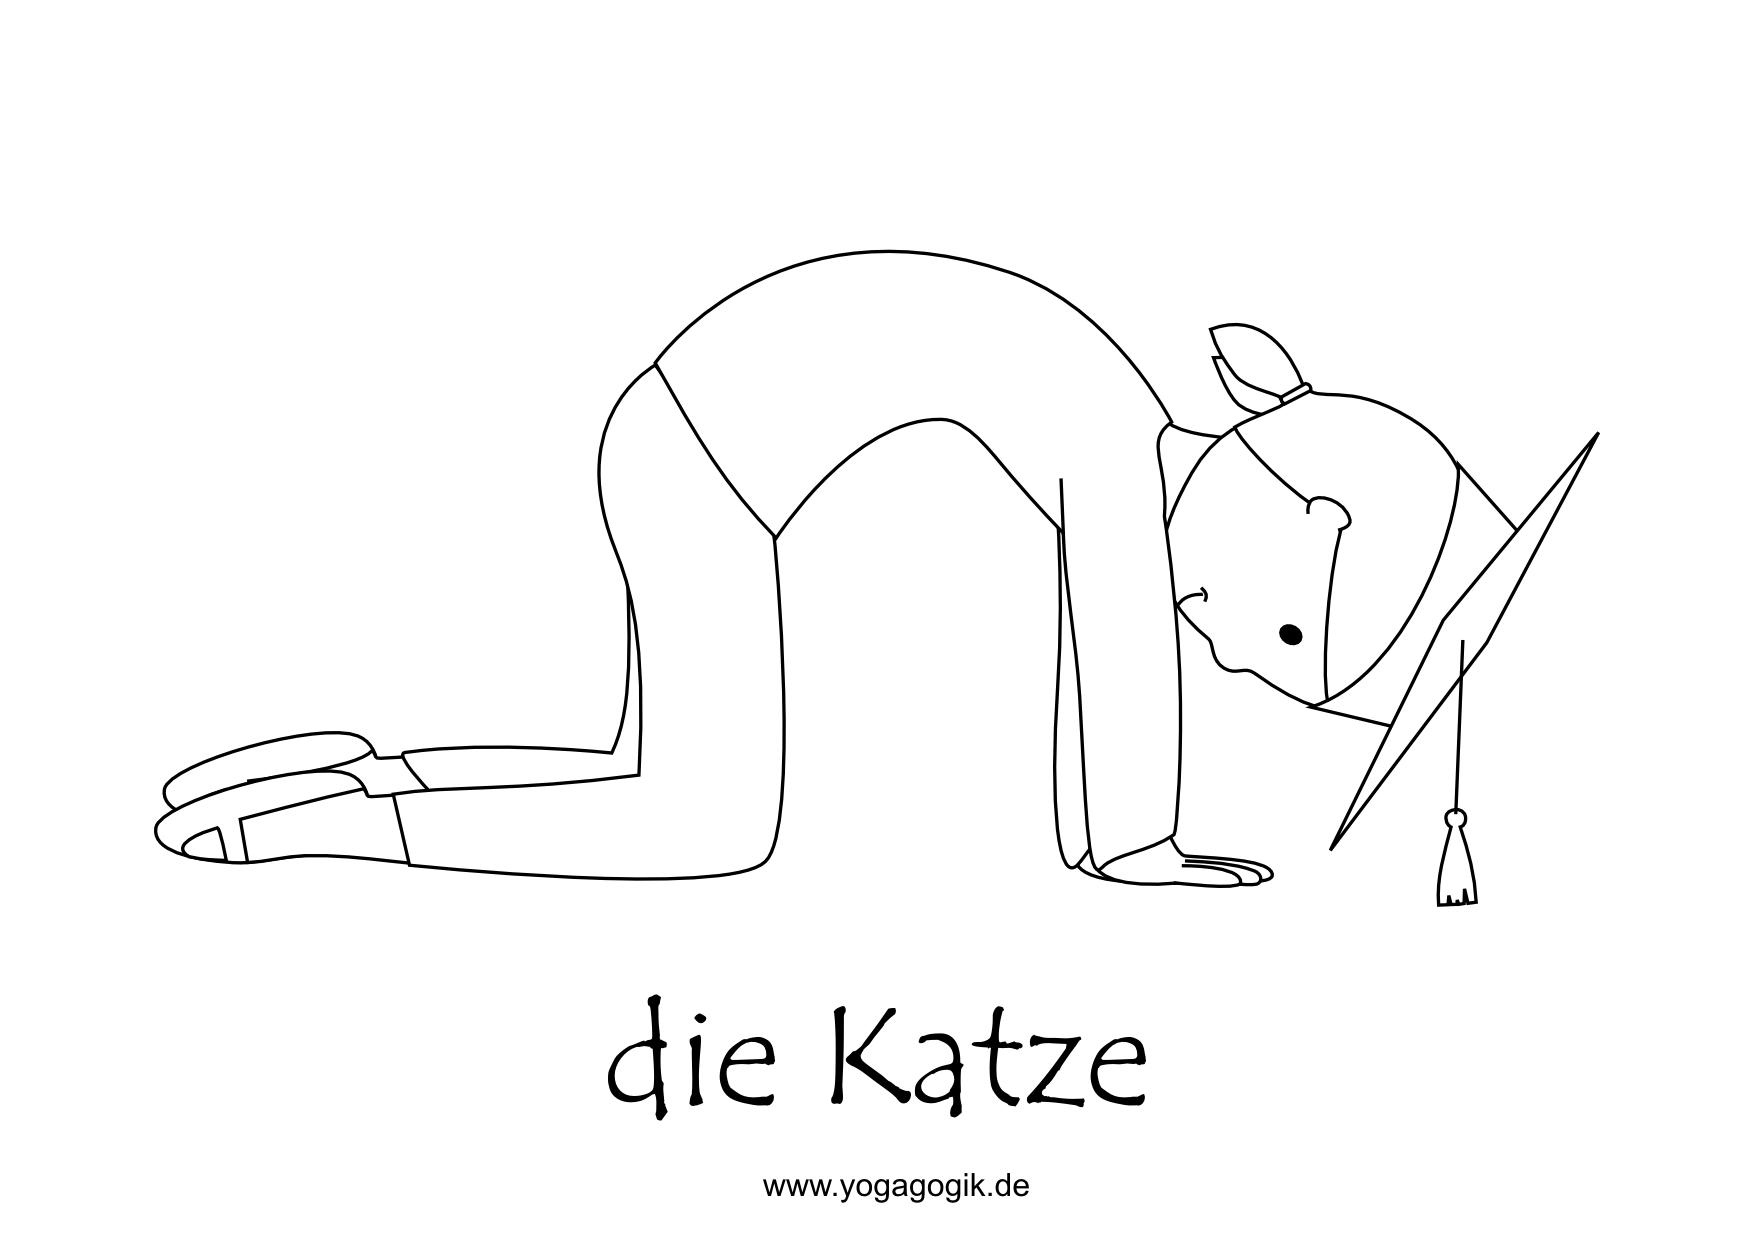 Katzen Ausmalbilder Für Kinder : Kinderyoga Ausmalbild Katze Yoga Pinterest Yoga